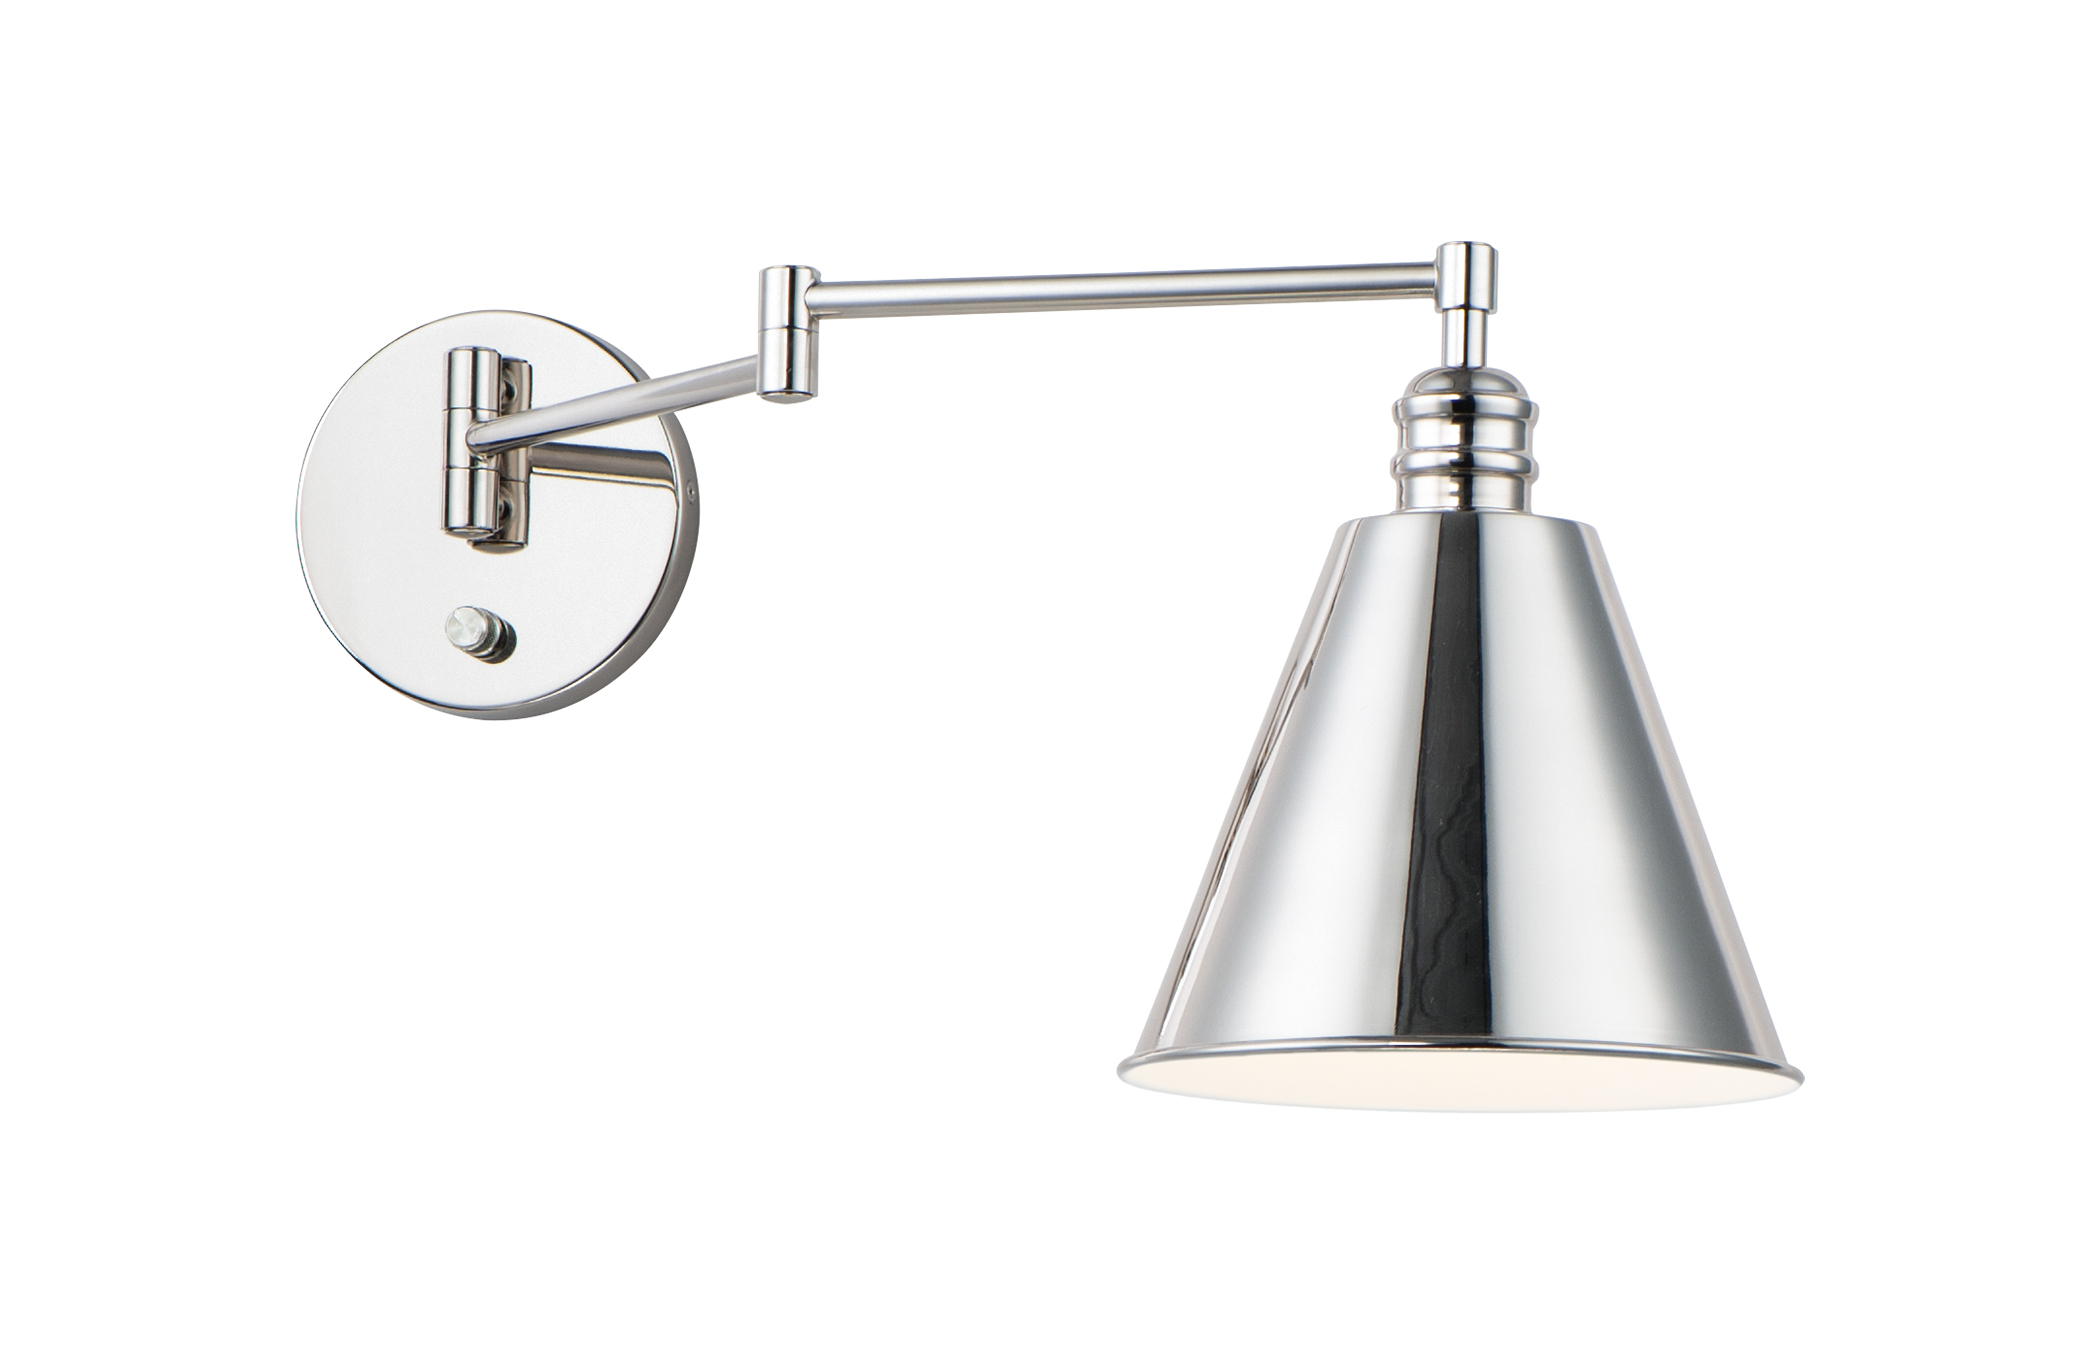 Library Wall Sconce Horizontal Swing Arm | Maxim Lighting